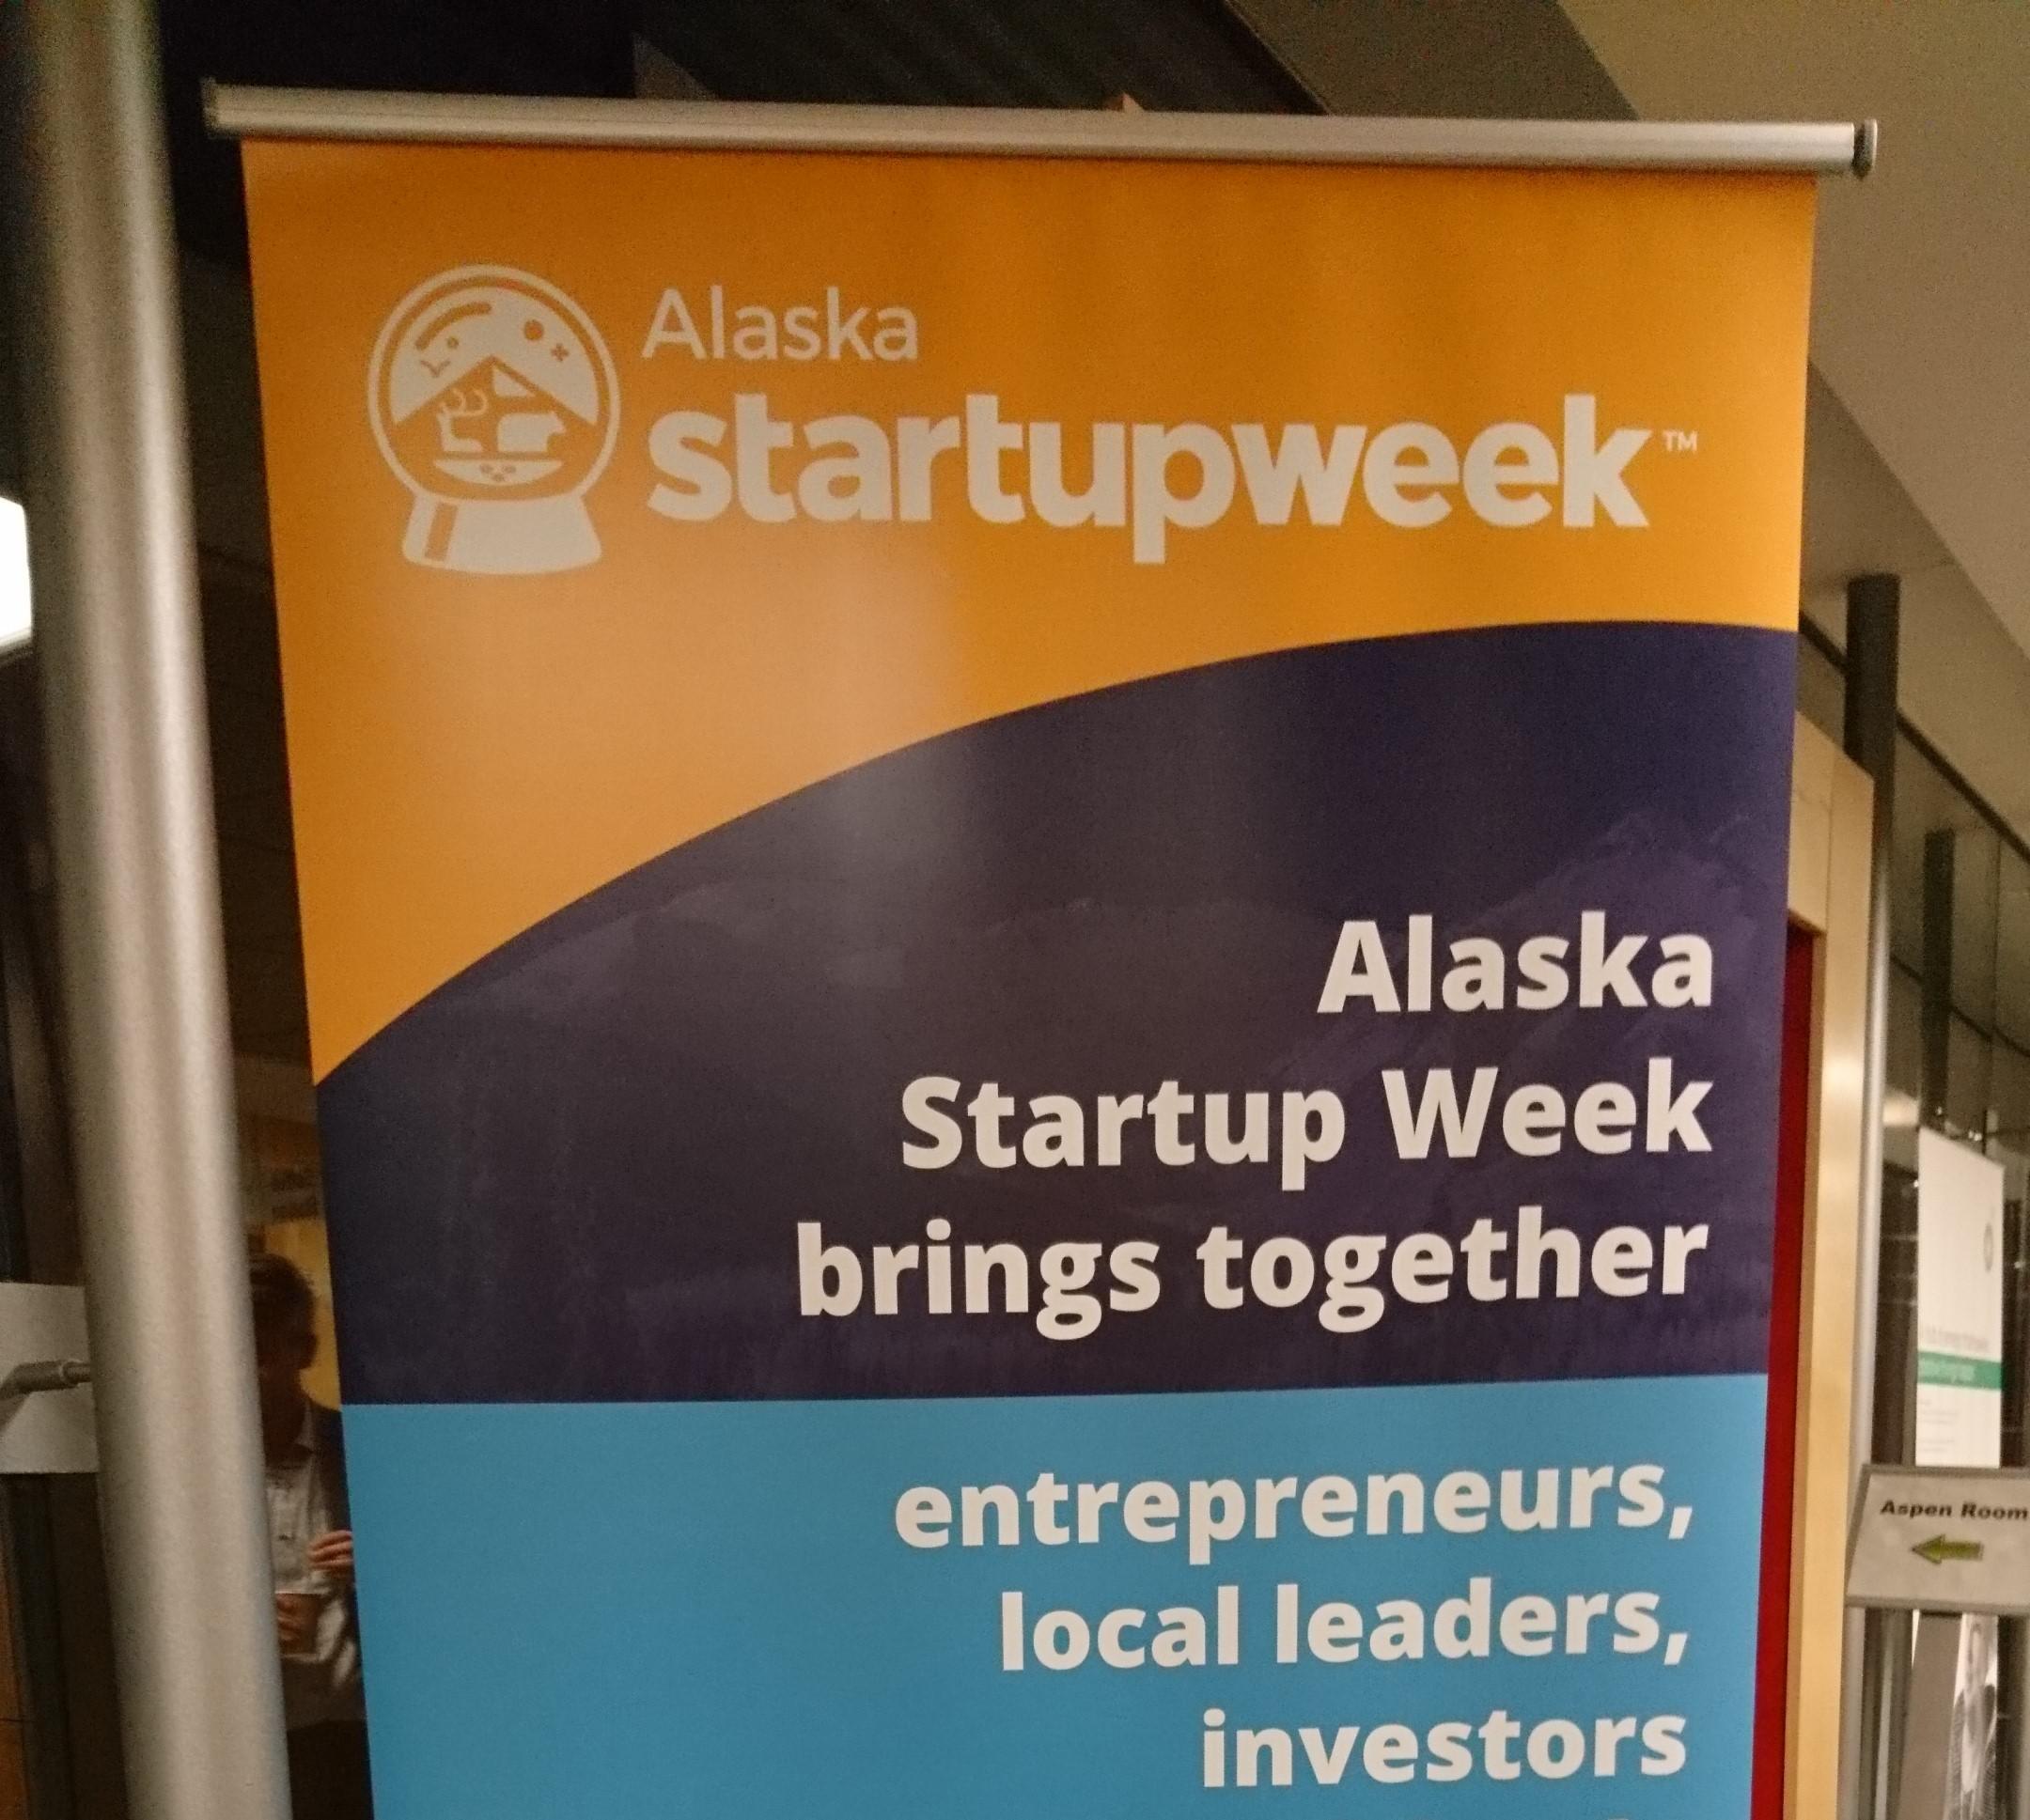 ARCT presents at Alaska Startupweek